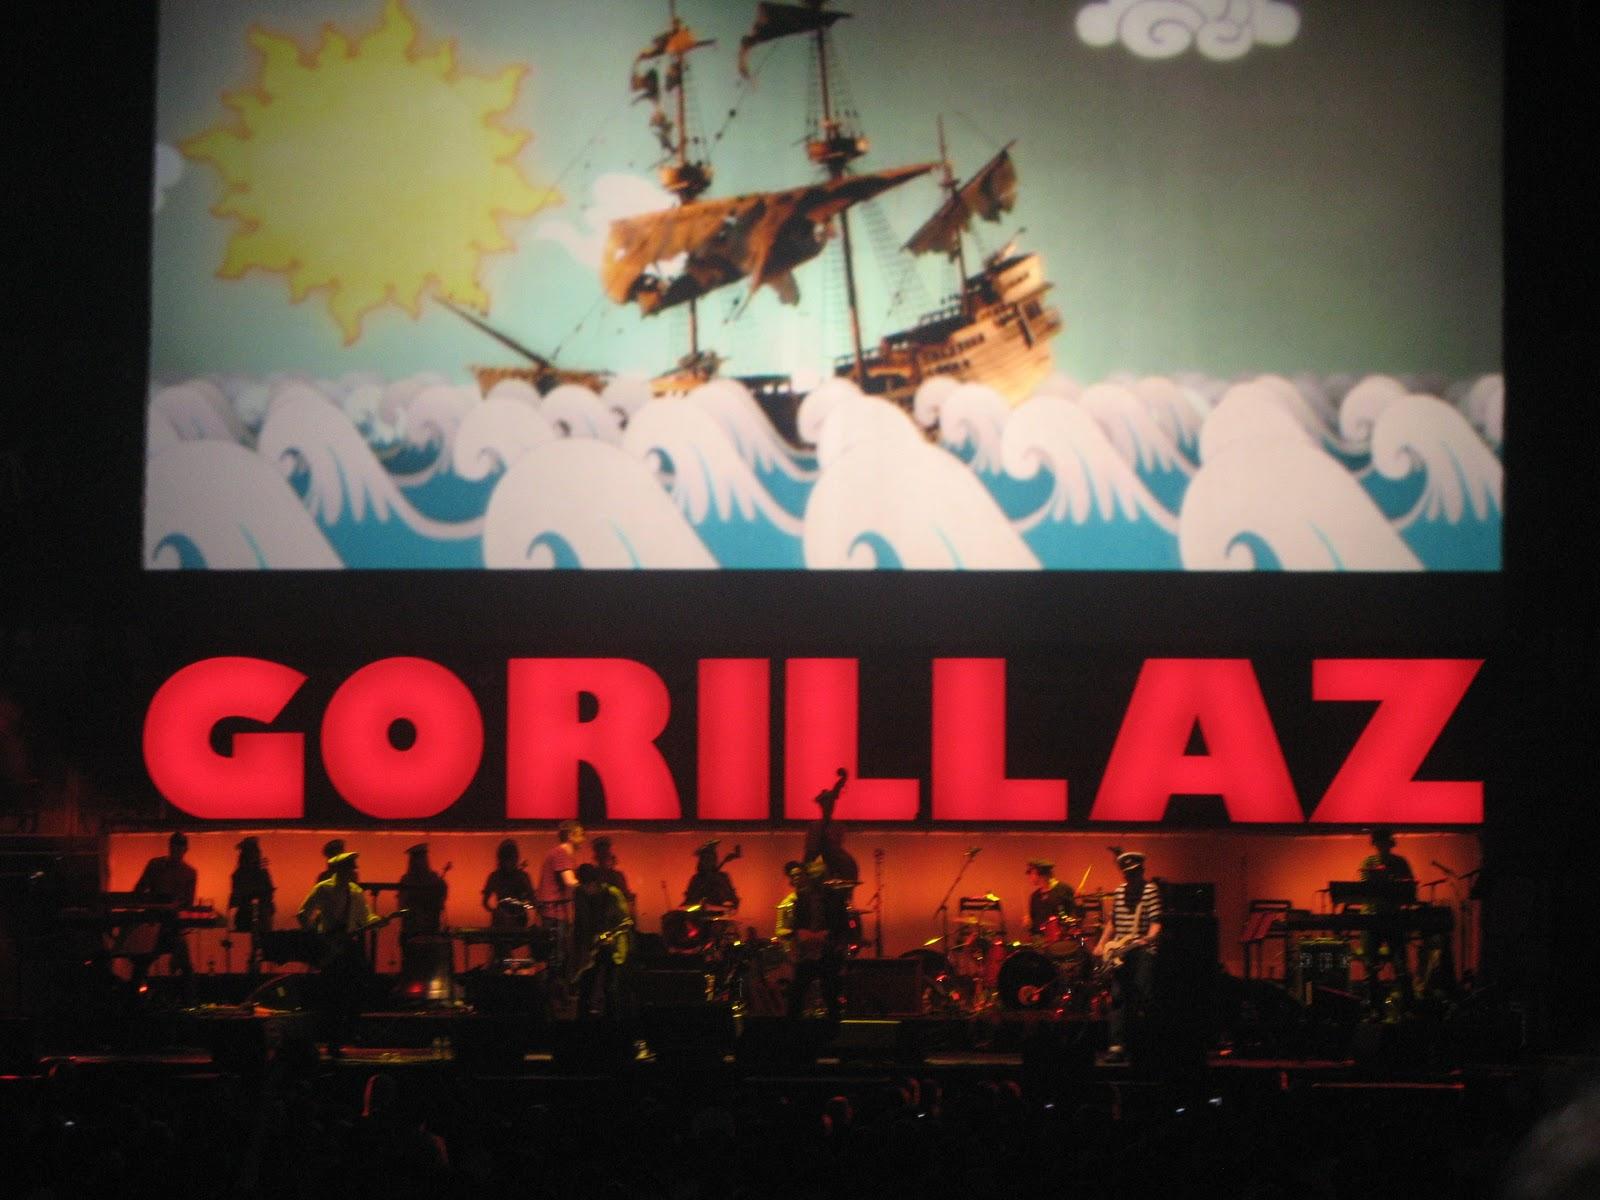 Gorillaz plastic beach wallpaper